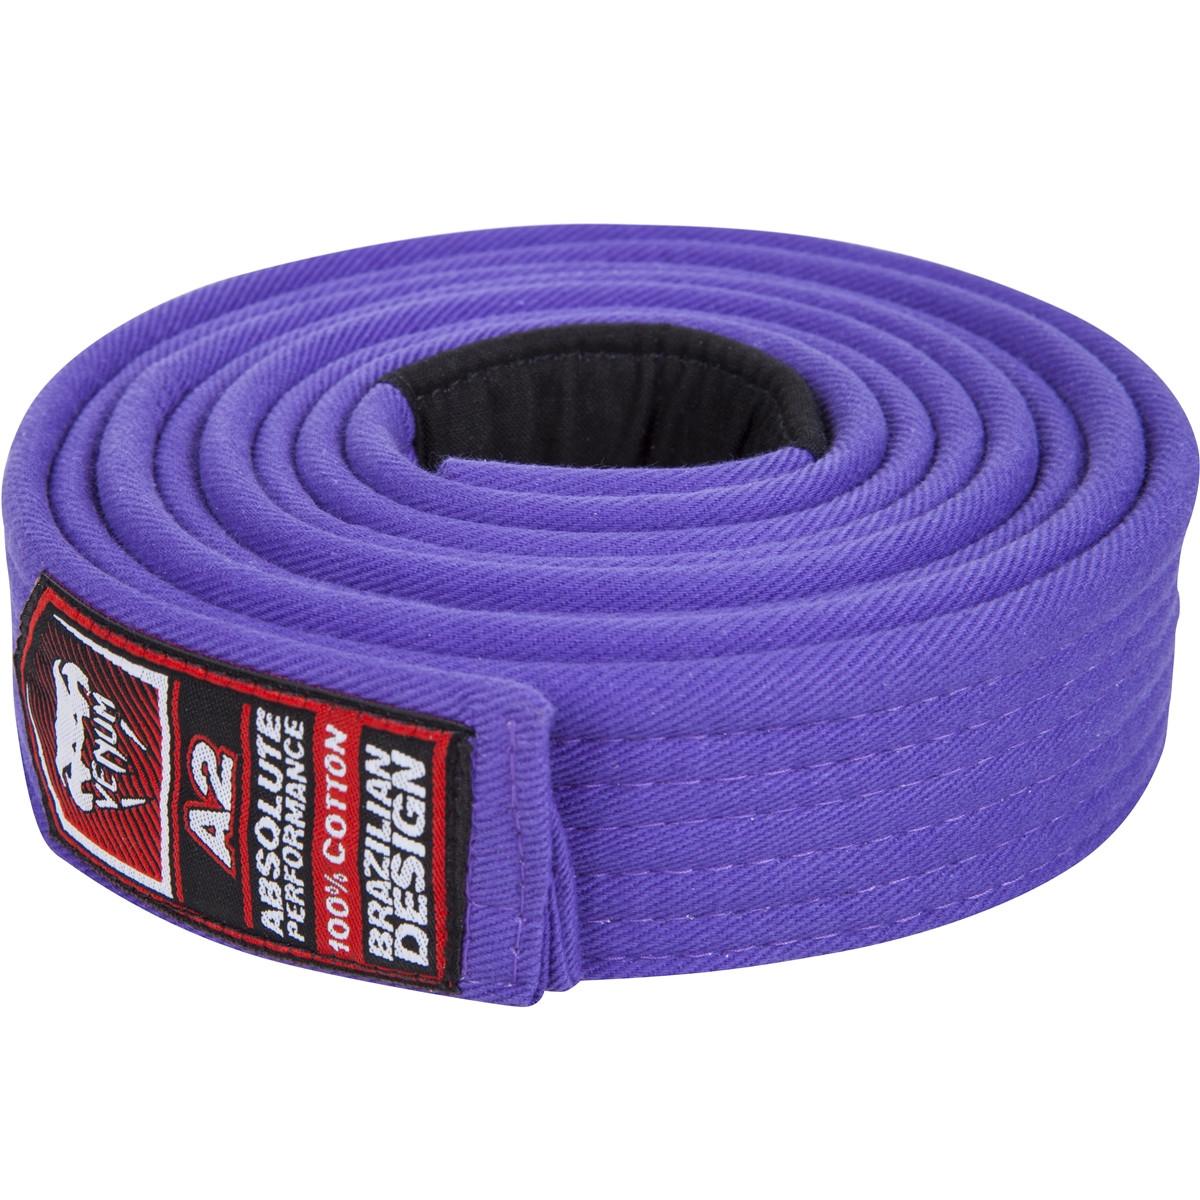 Venum Brazilian Jiu Jitsu purple belt , All Belt colors at www.thejiujitsushop.com   Enjoy Free shipping on Venum BJJ Belts today from The Jiu Jitsu Shop